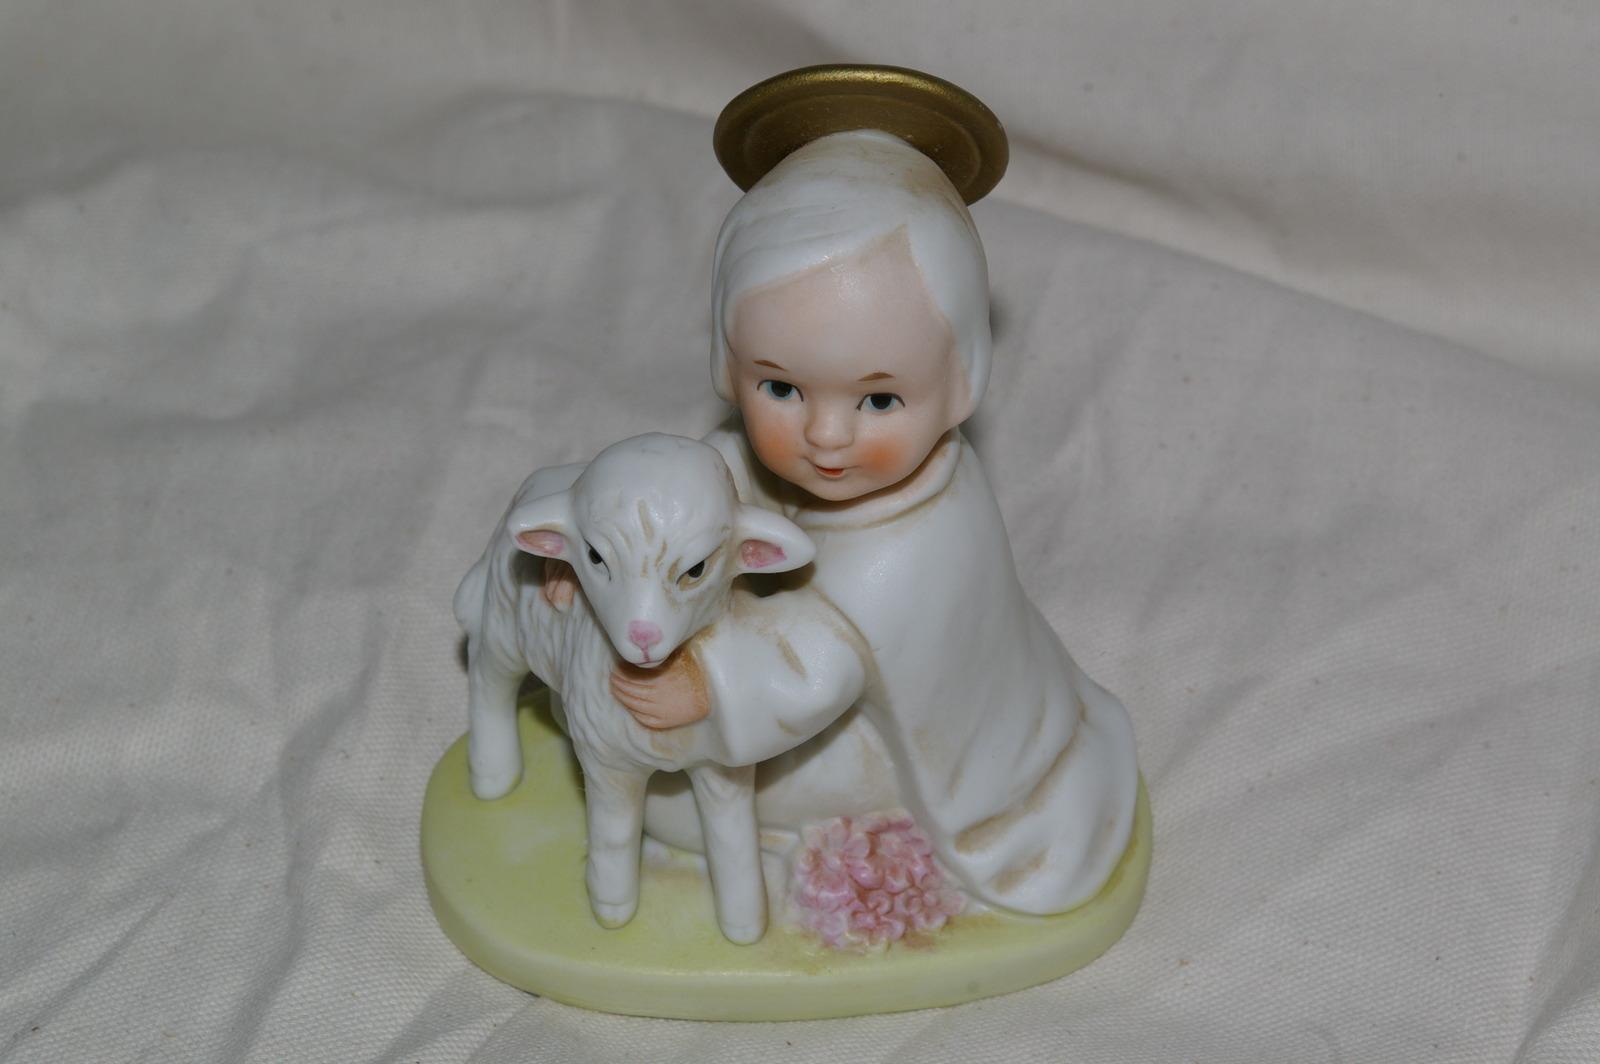 Homco Angel With Lamb Figurine 5605 Home Interiors Figurines